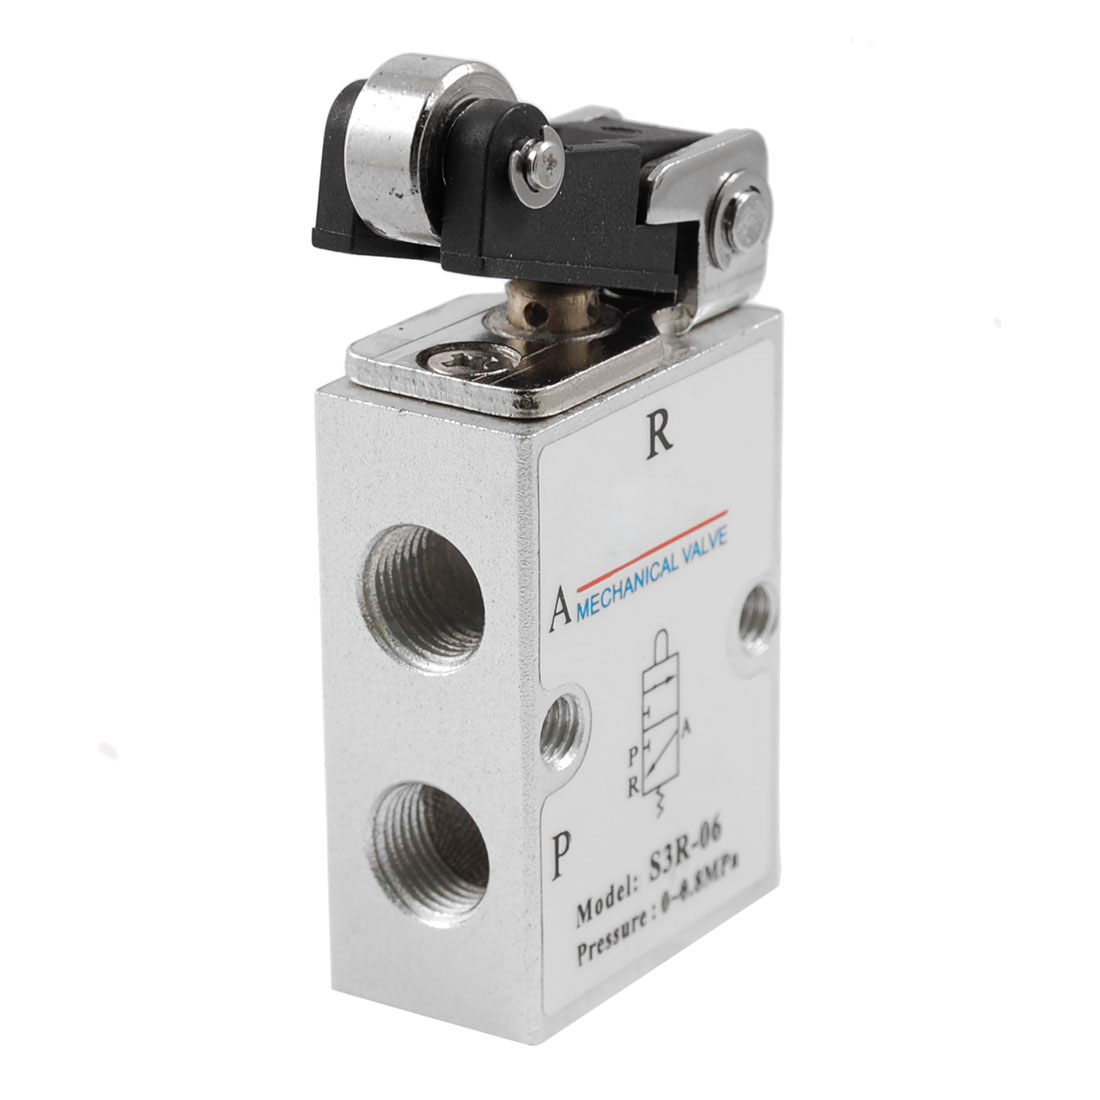 Roller Cam 2 Position 3 Way Pneumatic Air Mechanical Valve S3R-06